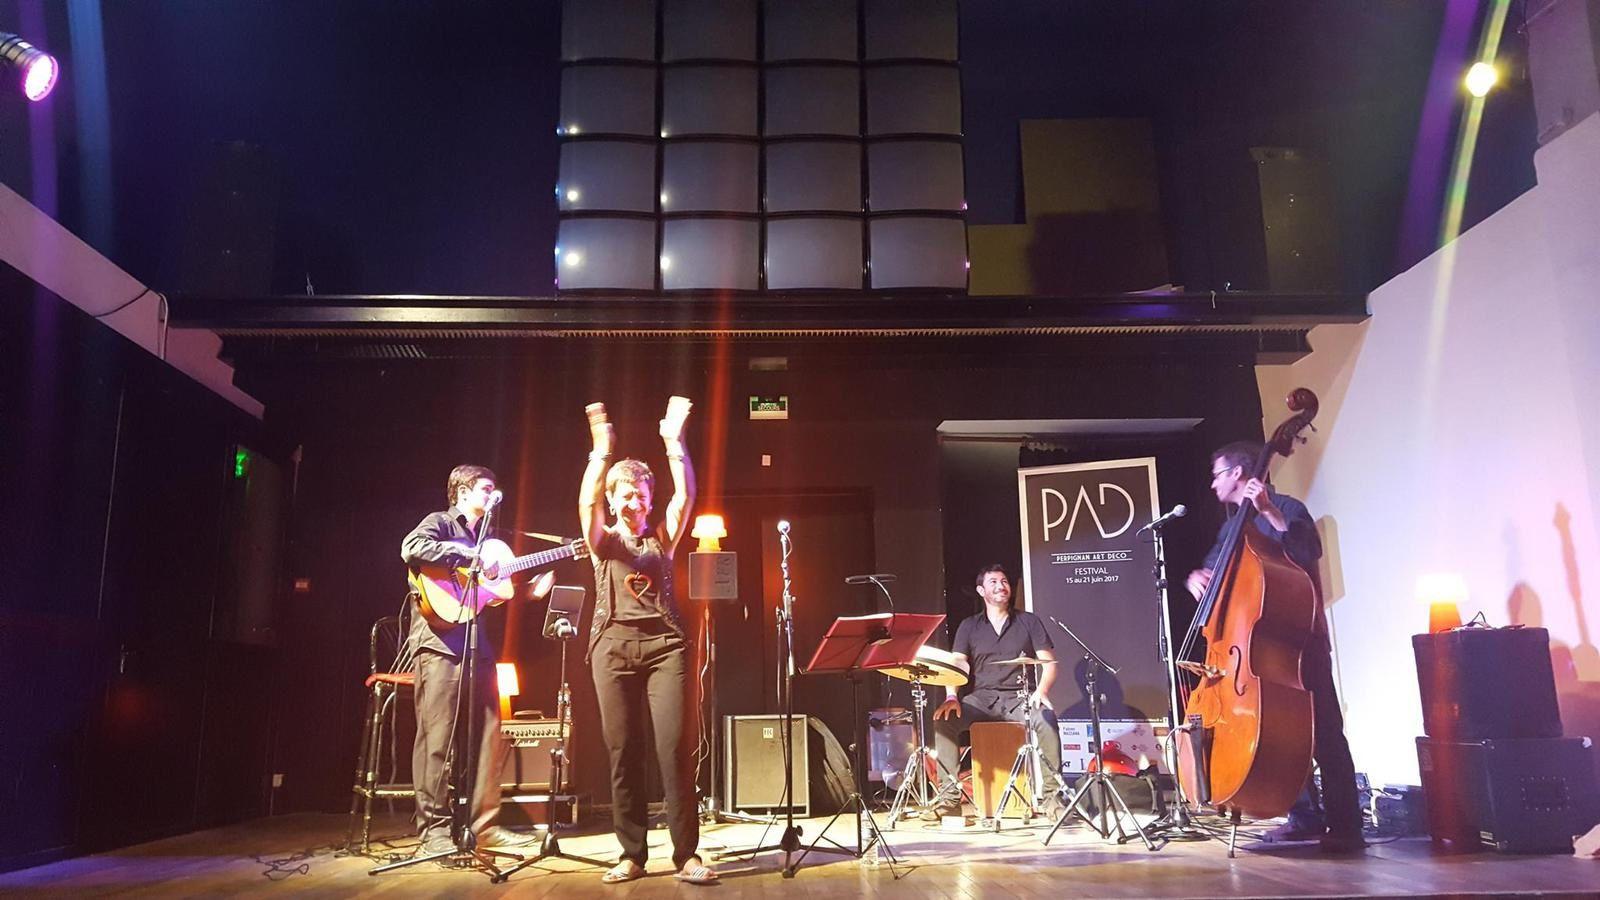 Tango et concert Violeta Duarte &amp&#x3B; le Trio Sensible au Centro Espagnol